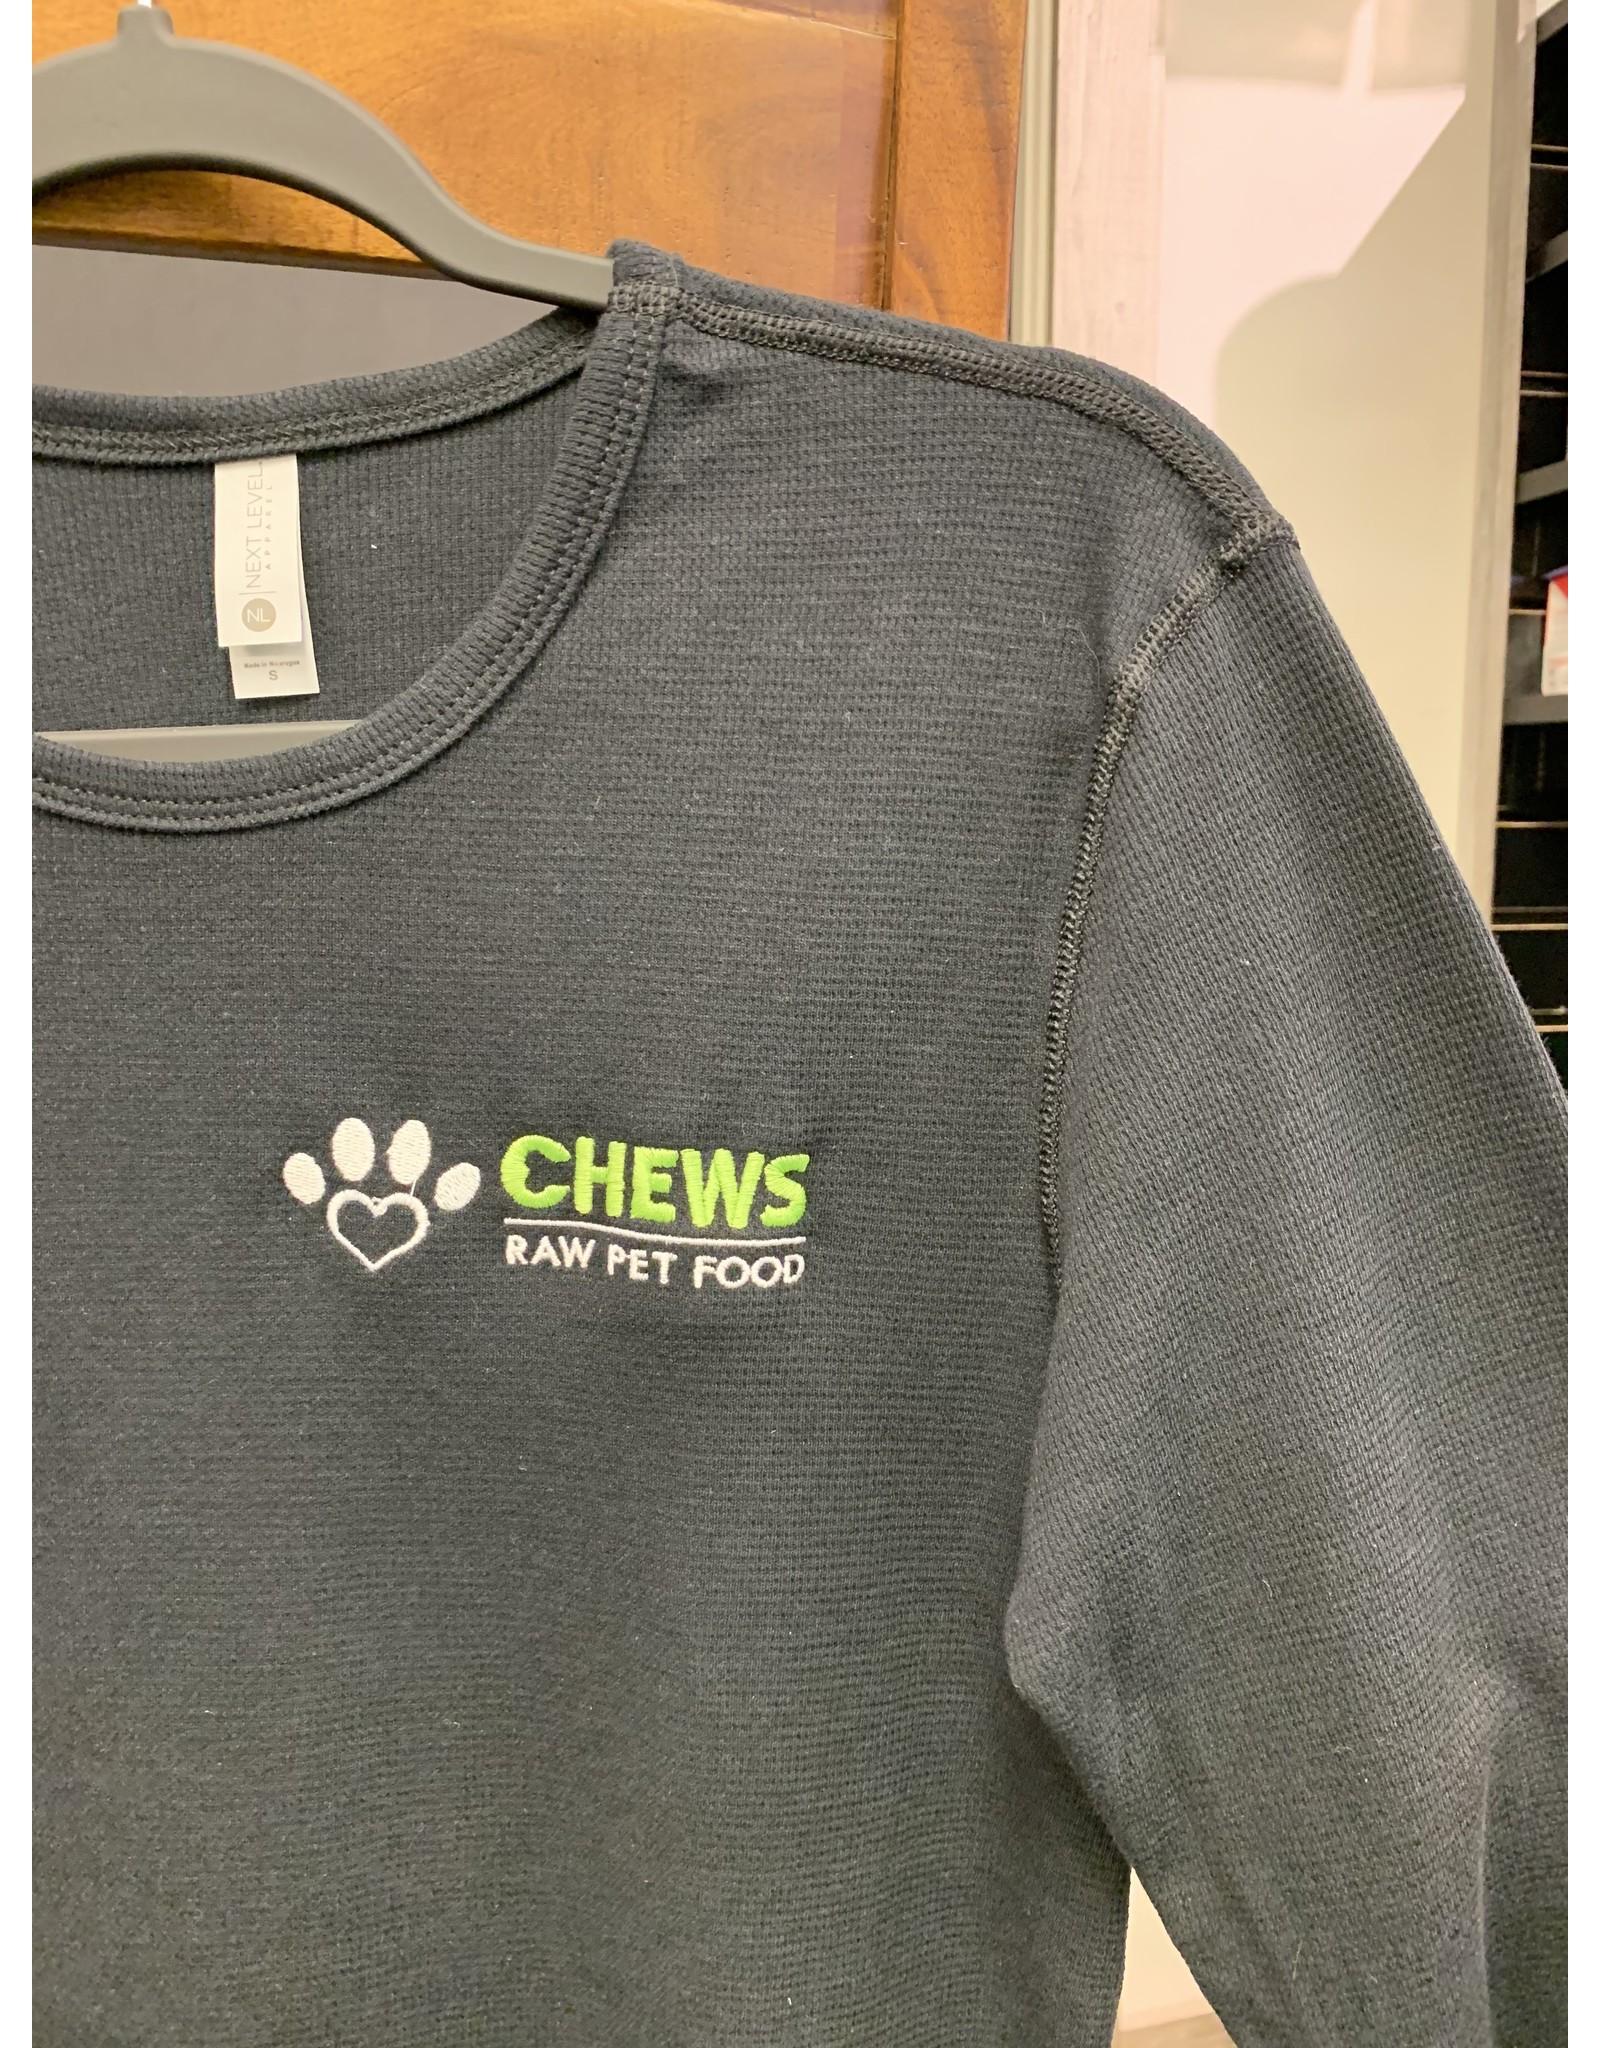 Chews Chews - Apparel - Waffle Long Sleeve - Black